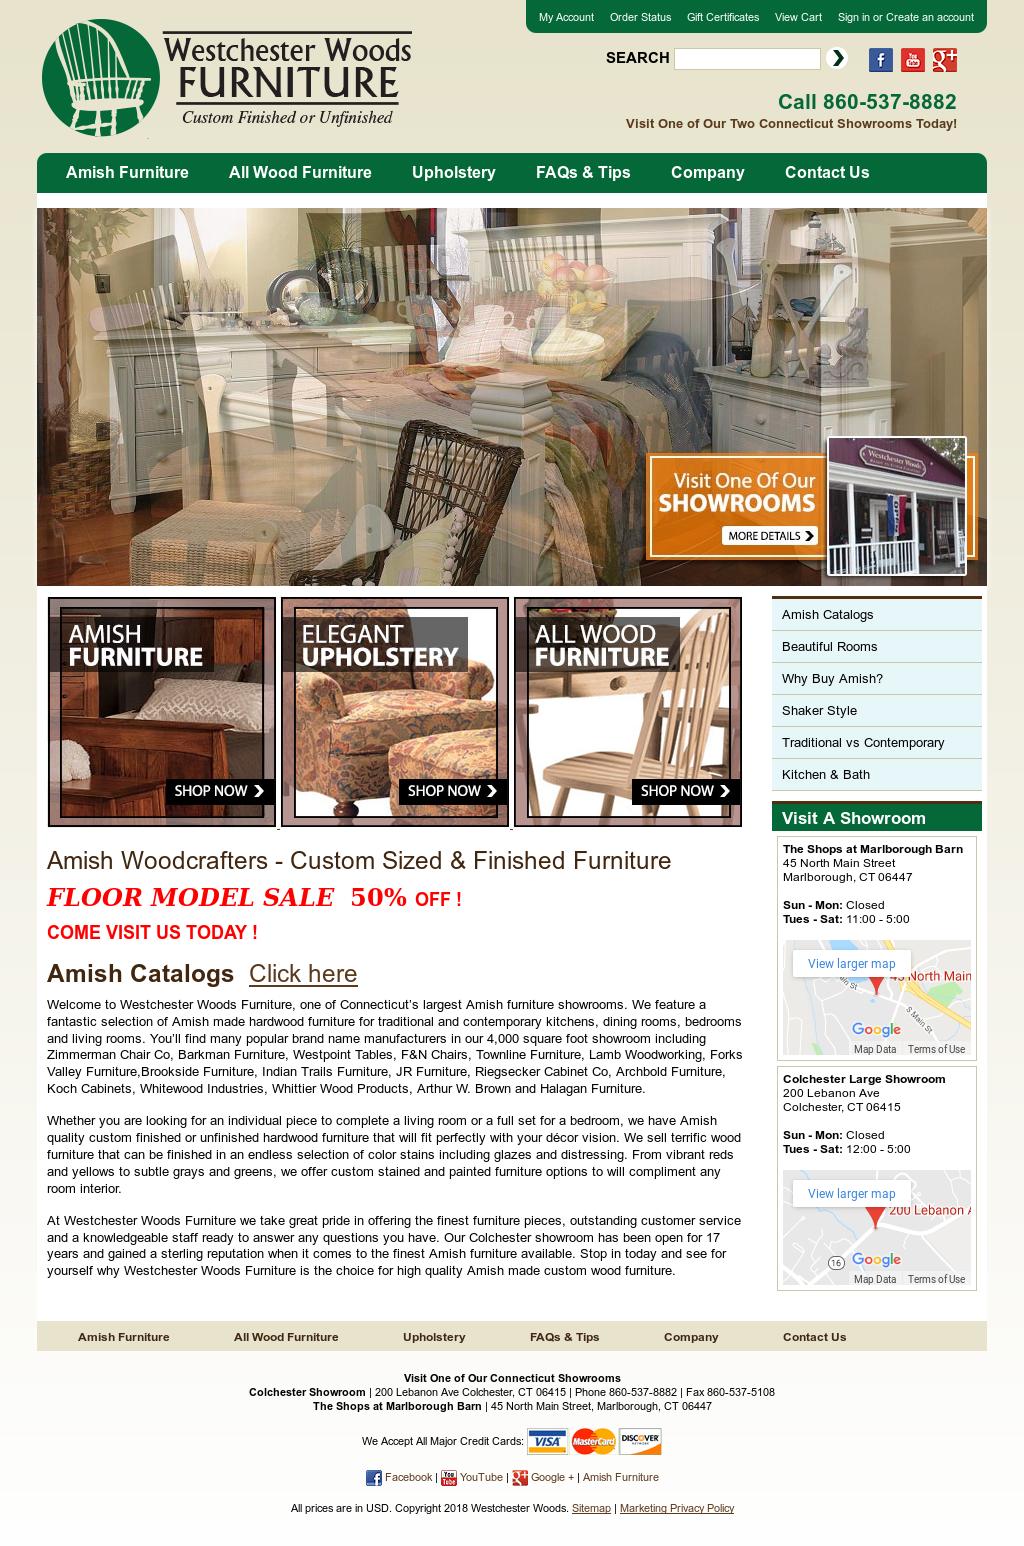 Genial Westchester Woods Furniture Website History